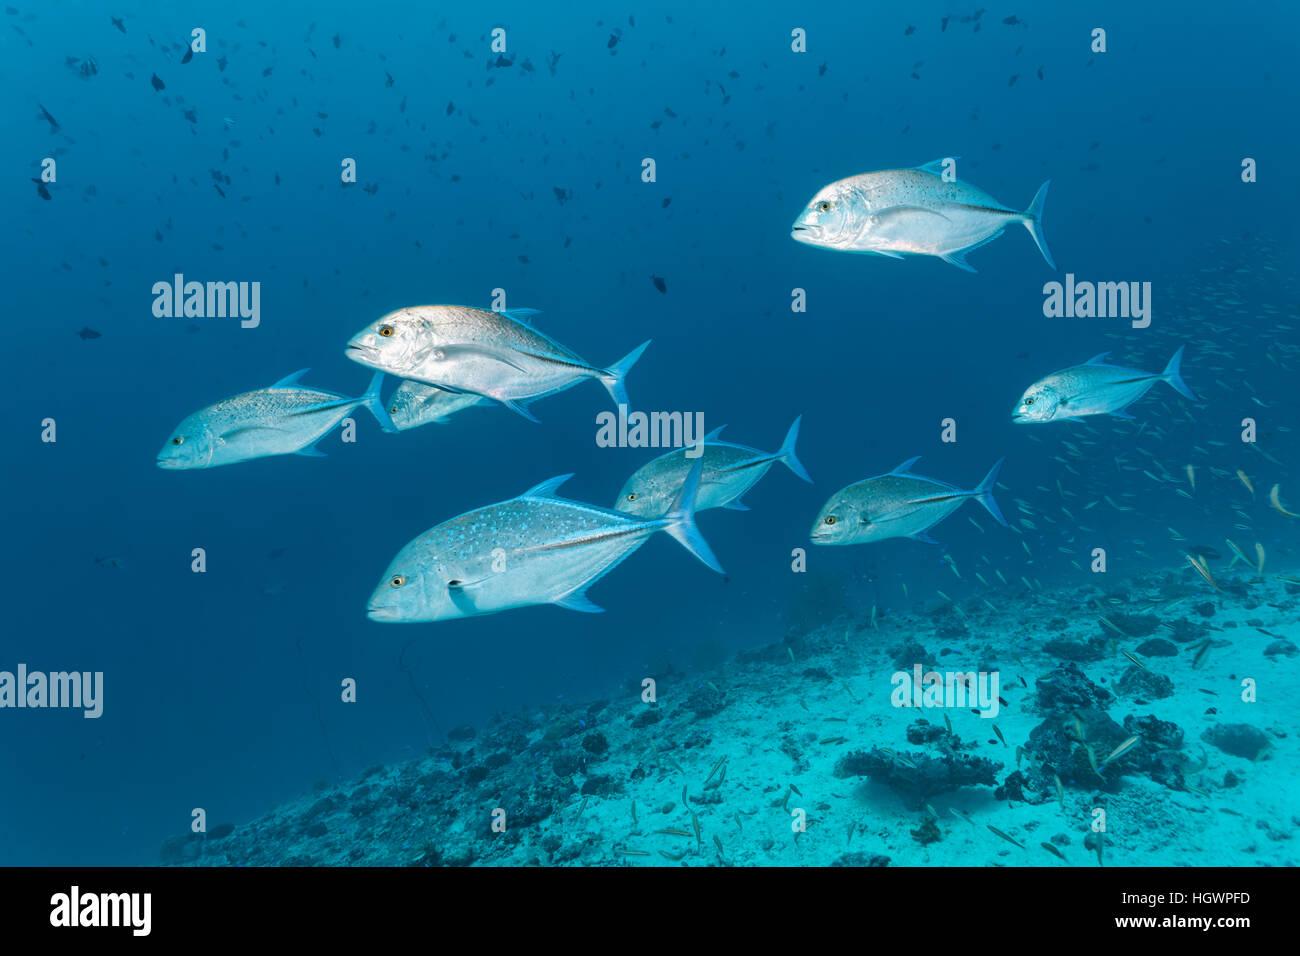 School of bluefin trevally (Caranx melampygus), chasing small fish on coral reef, Lhaviyani Atoll, Maldives - Stock Image